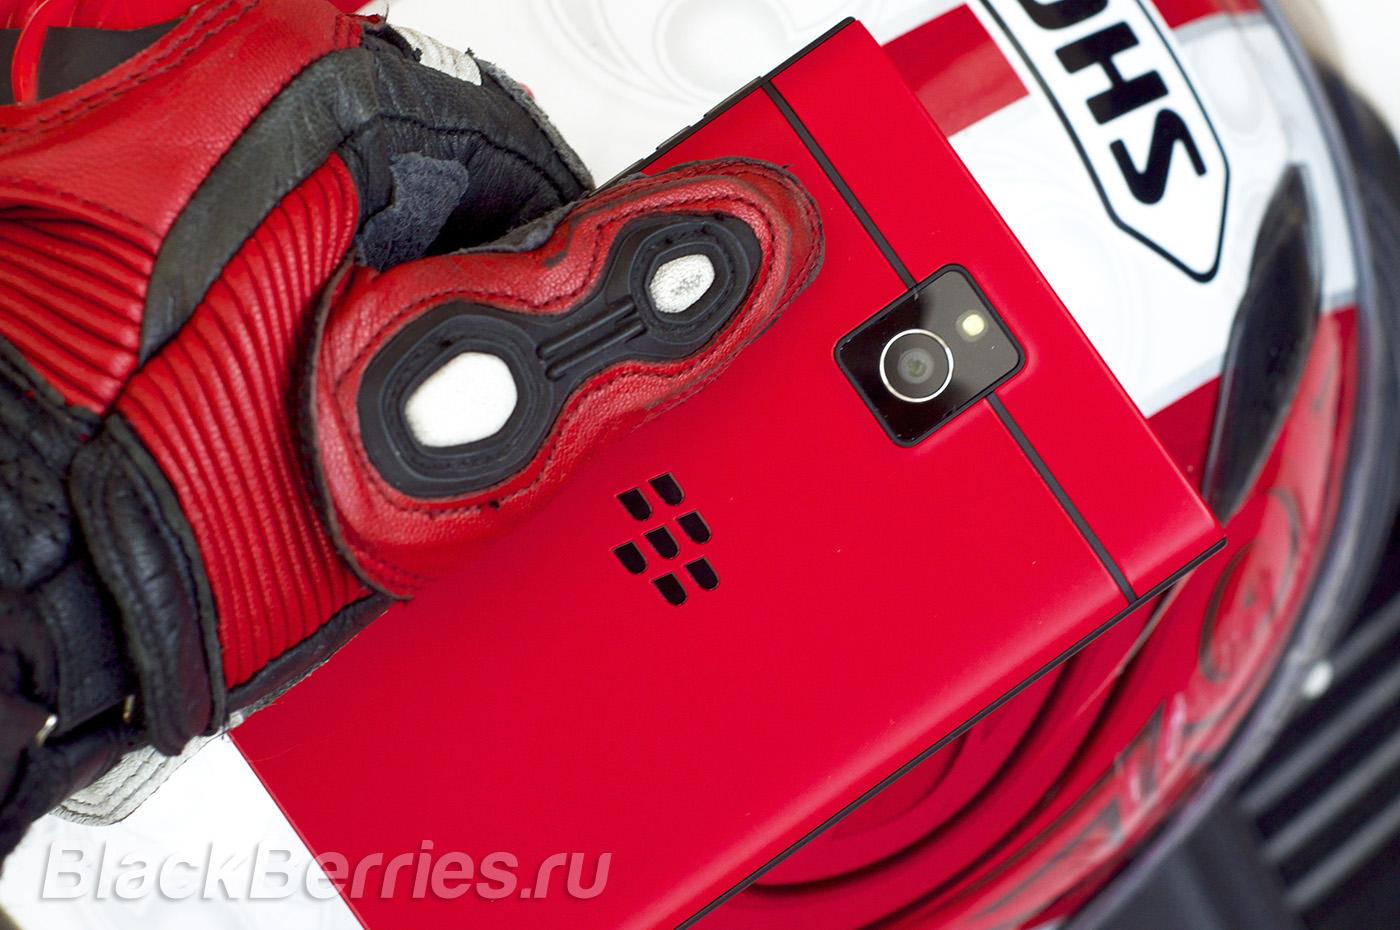 BlackBerry-Passport-Red-16